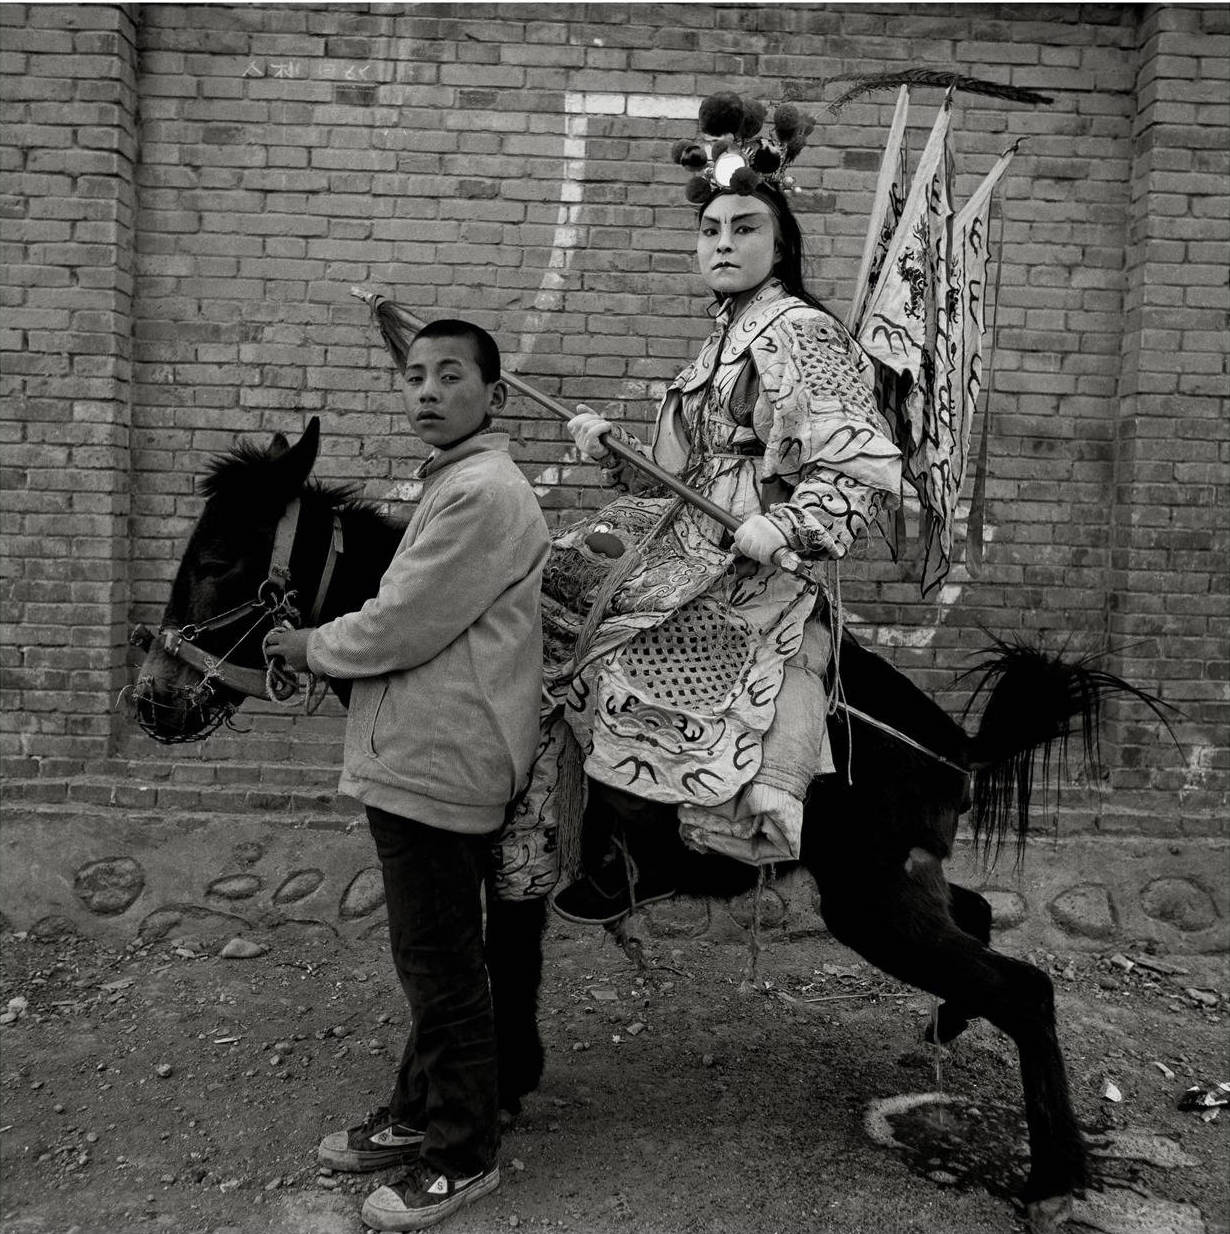 Warrior On Donkey, Longxian, Shaanxi Province, 1999, Gelatin silver print